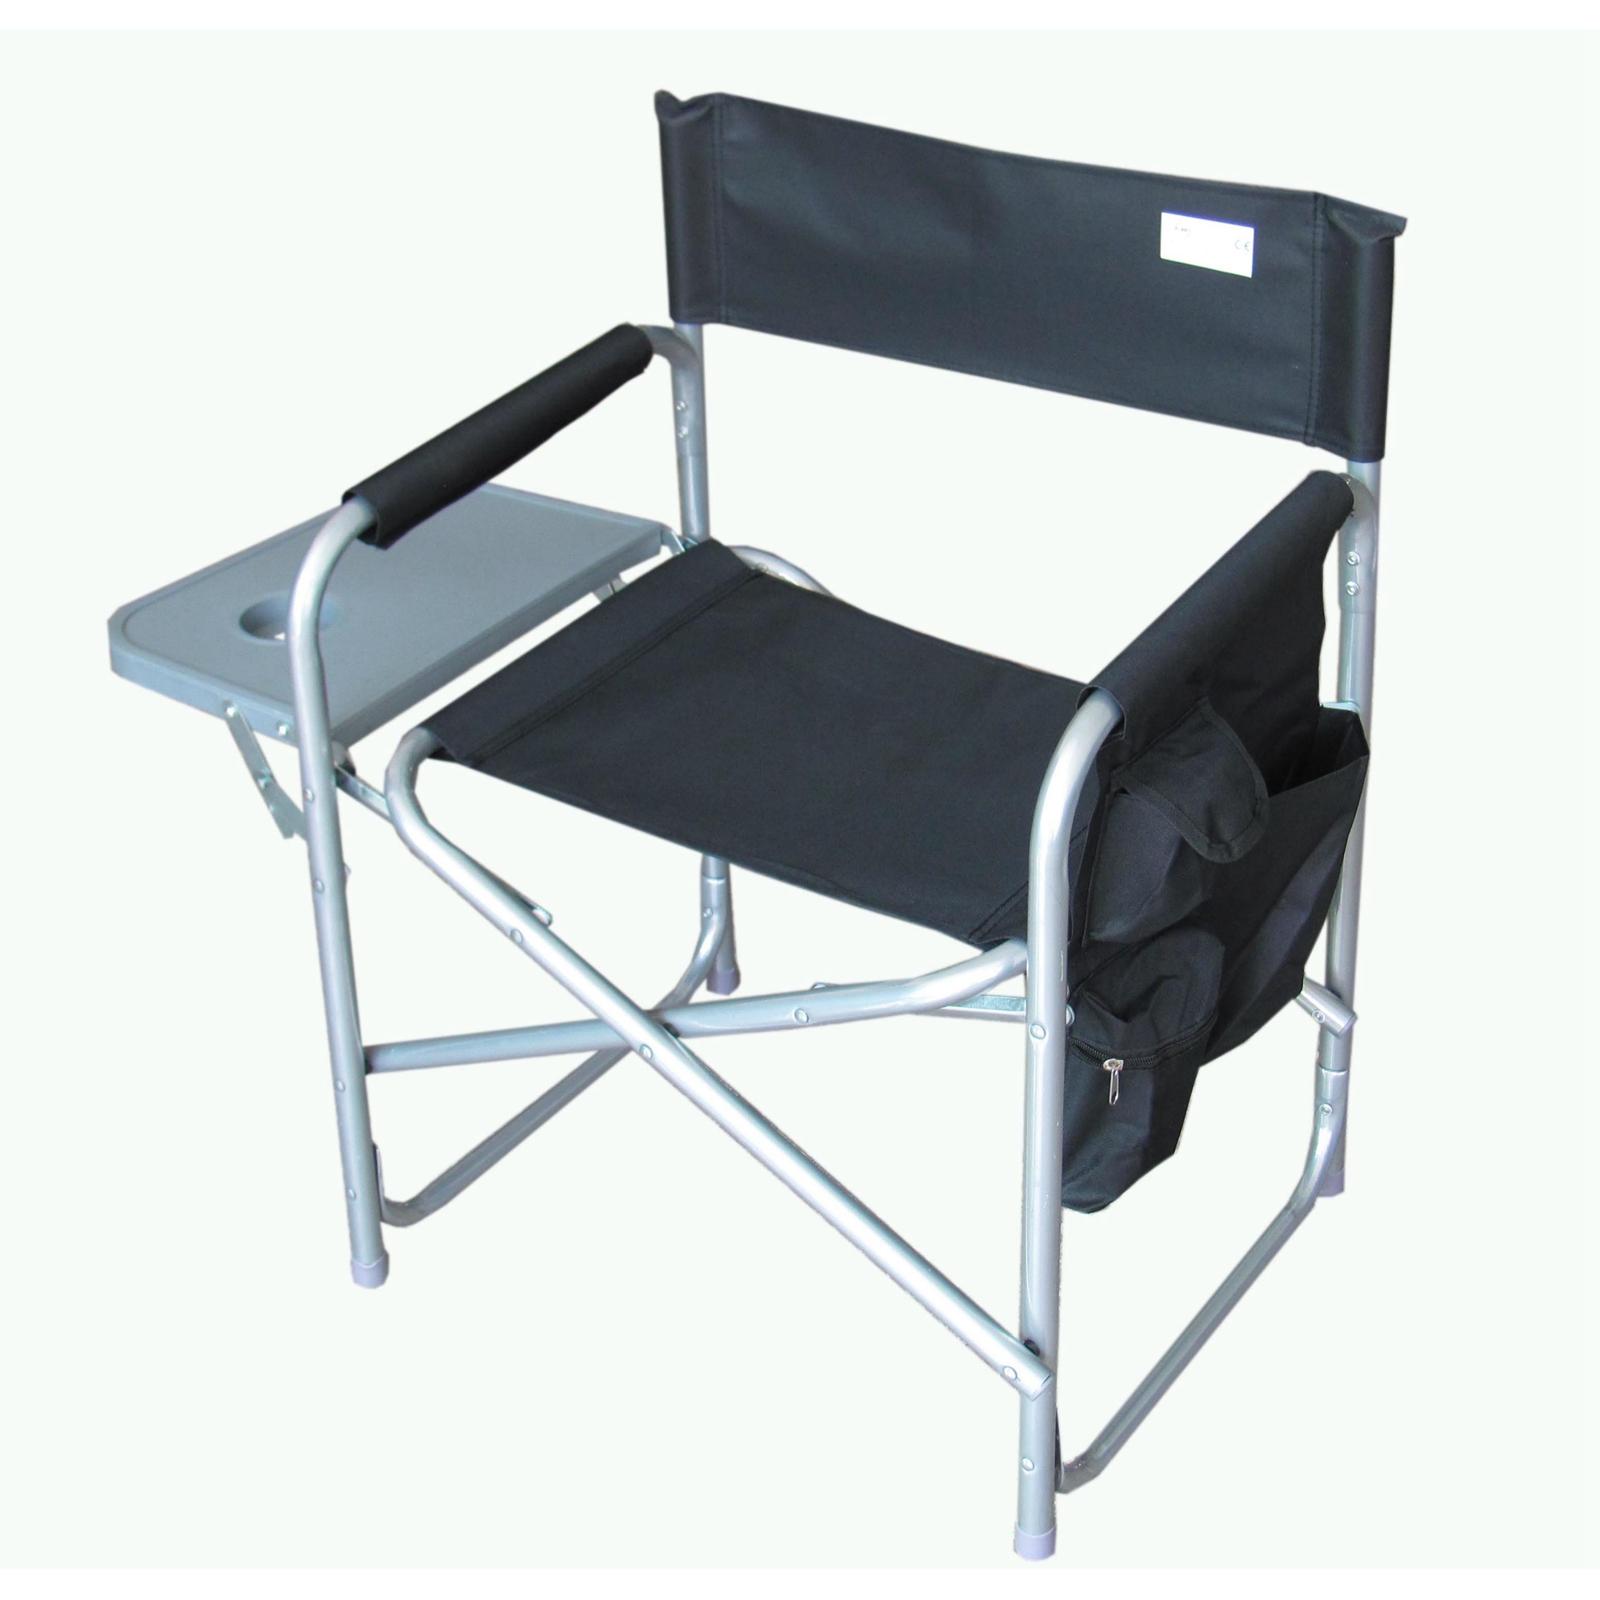 portable folding floor chairs glider rocking chair walmart fishing camping outdoor garden seat